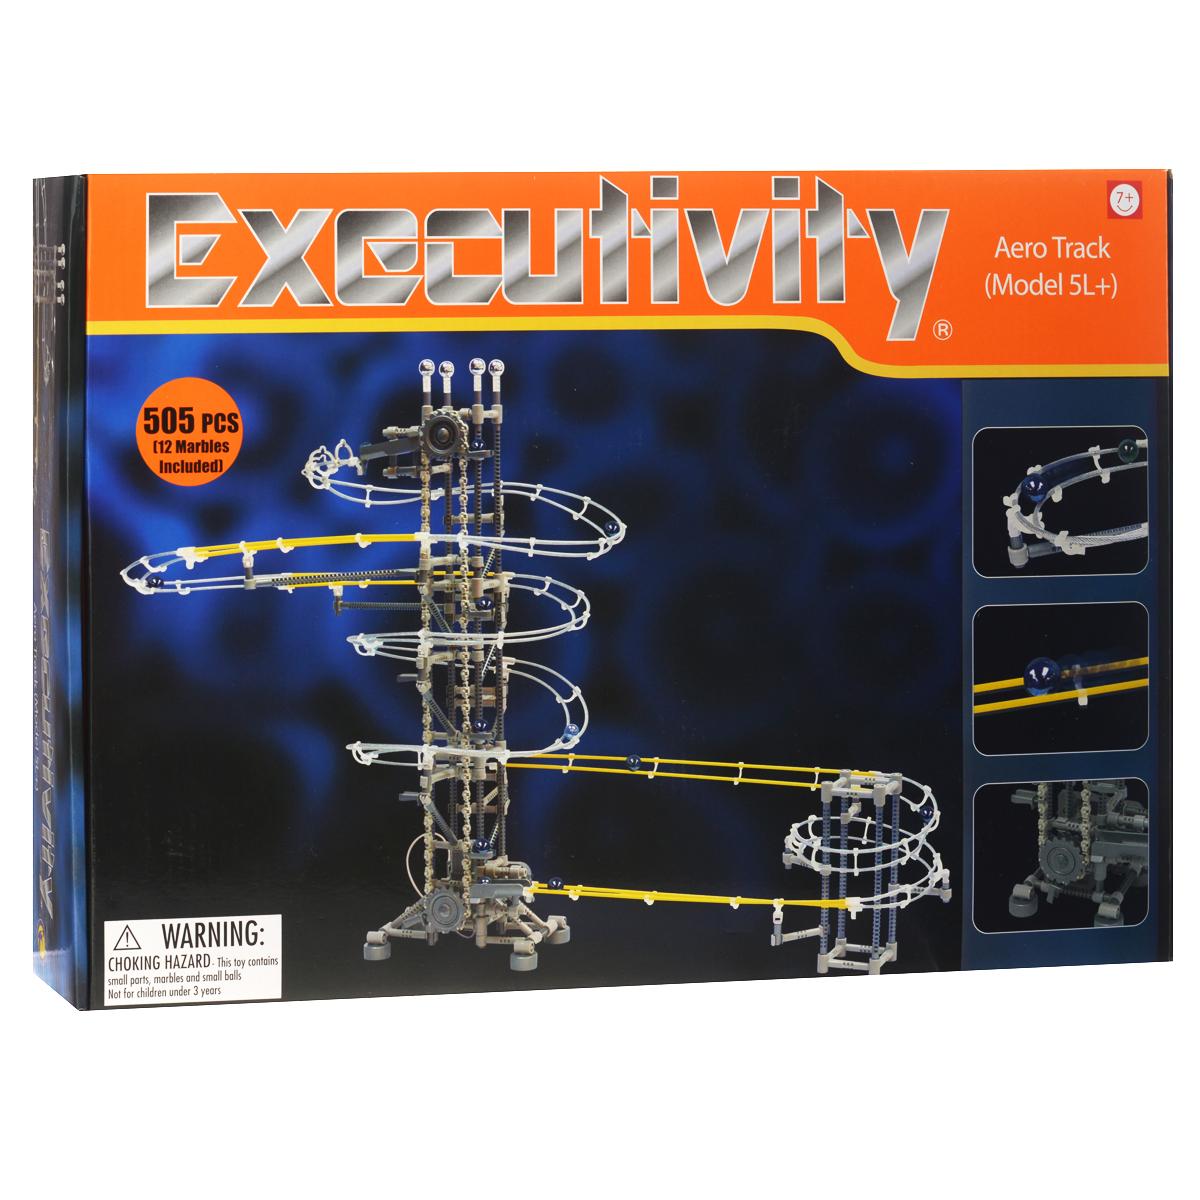 Executivity Конструктор Aero Track 5L+